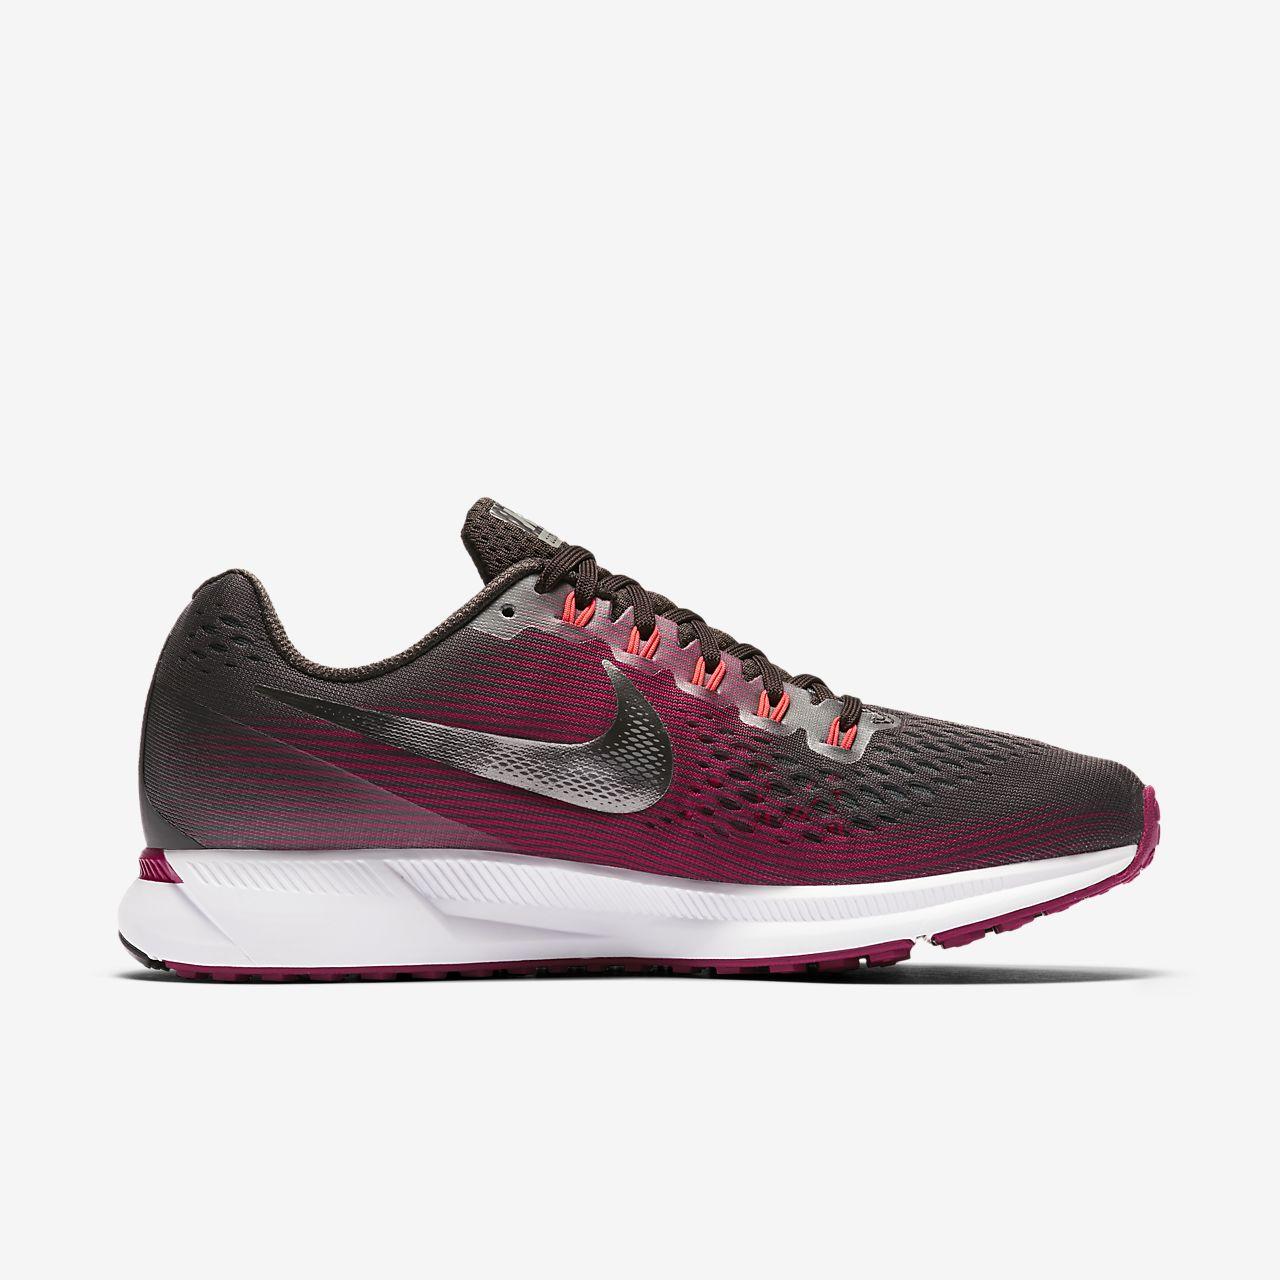 hot sales d3827 45453 Nike Air Zoom Pegasus 34 W nike pegasus femme. Chaussures de running ...